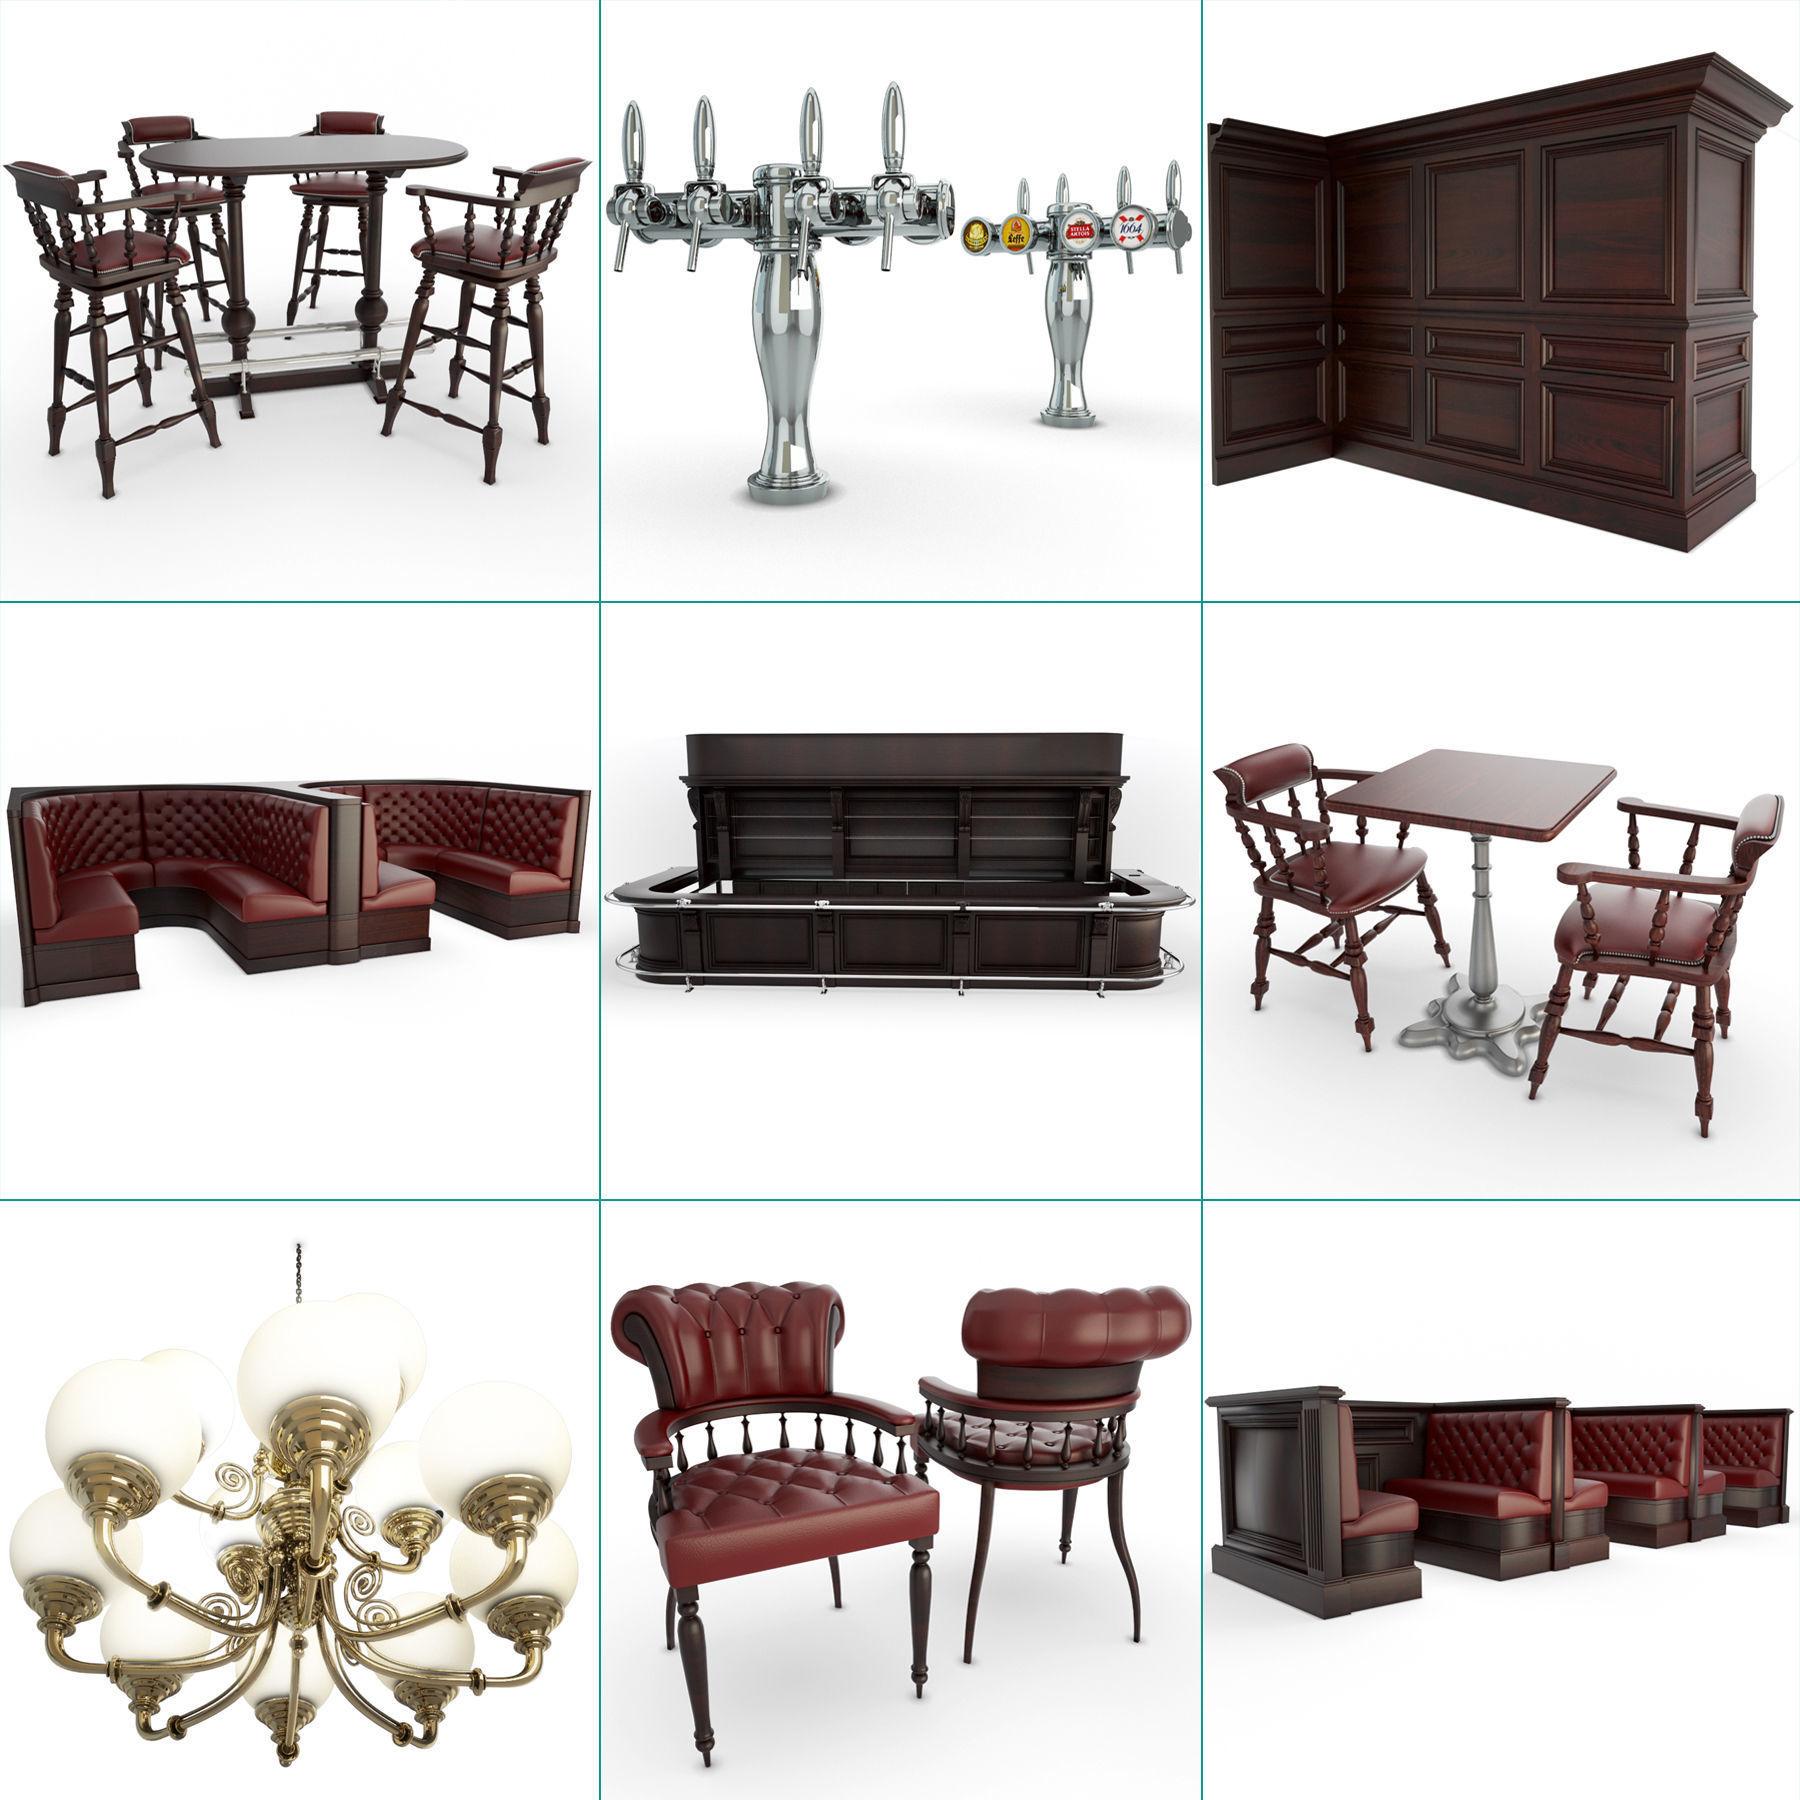 English Pub Furniture and Lighting Collection